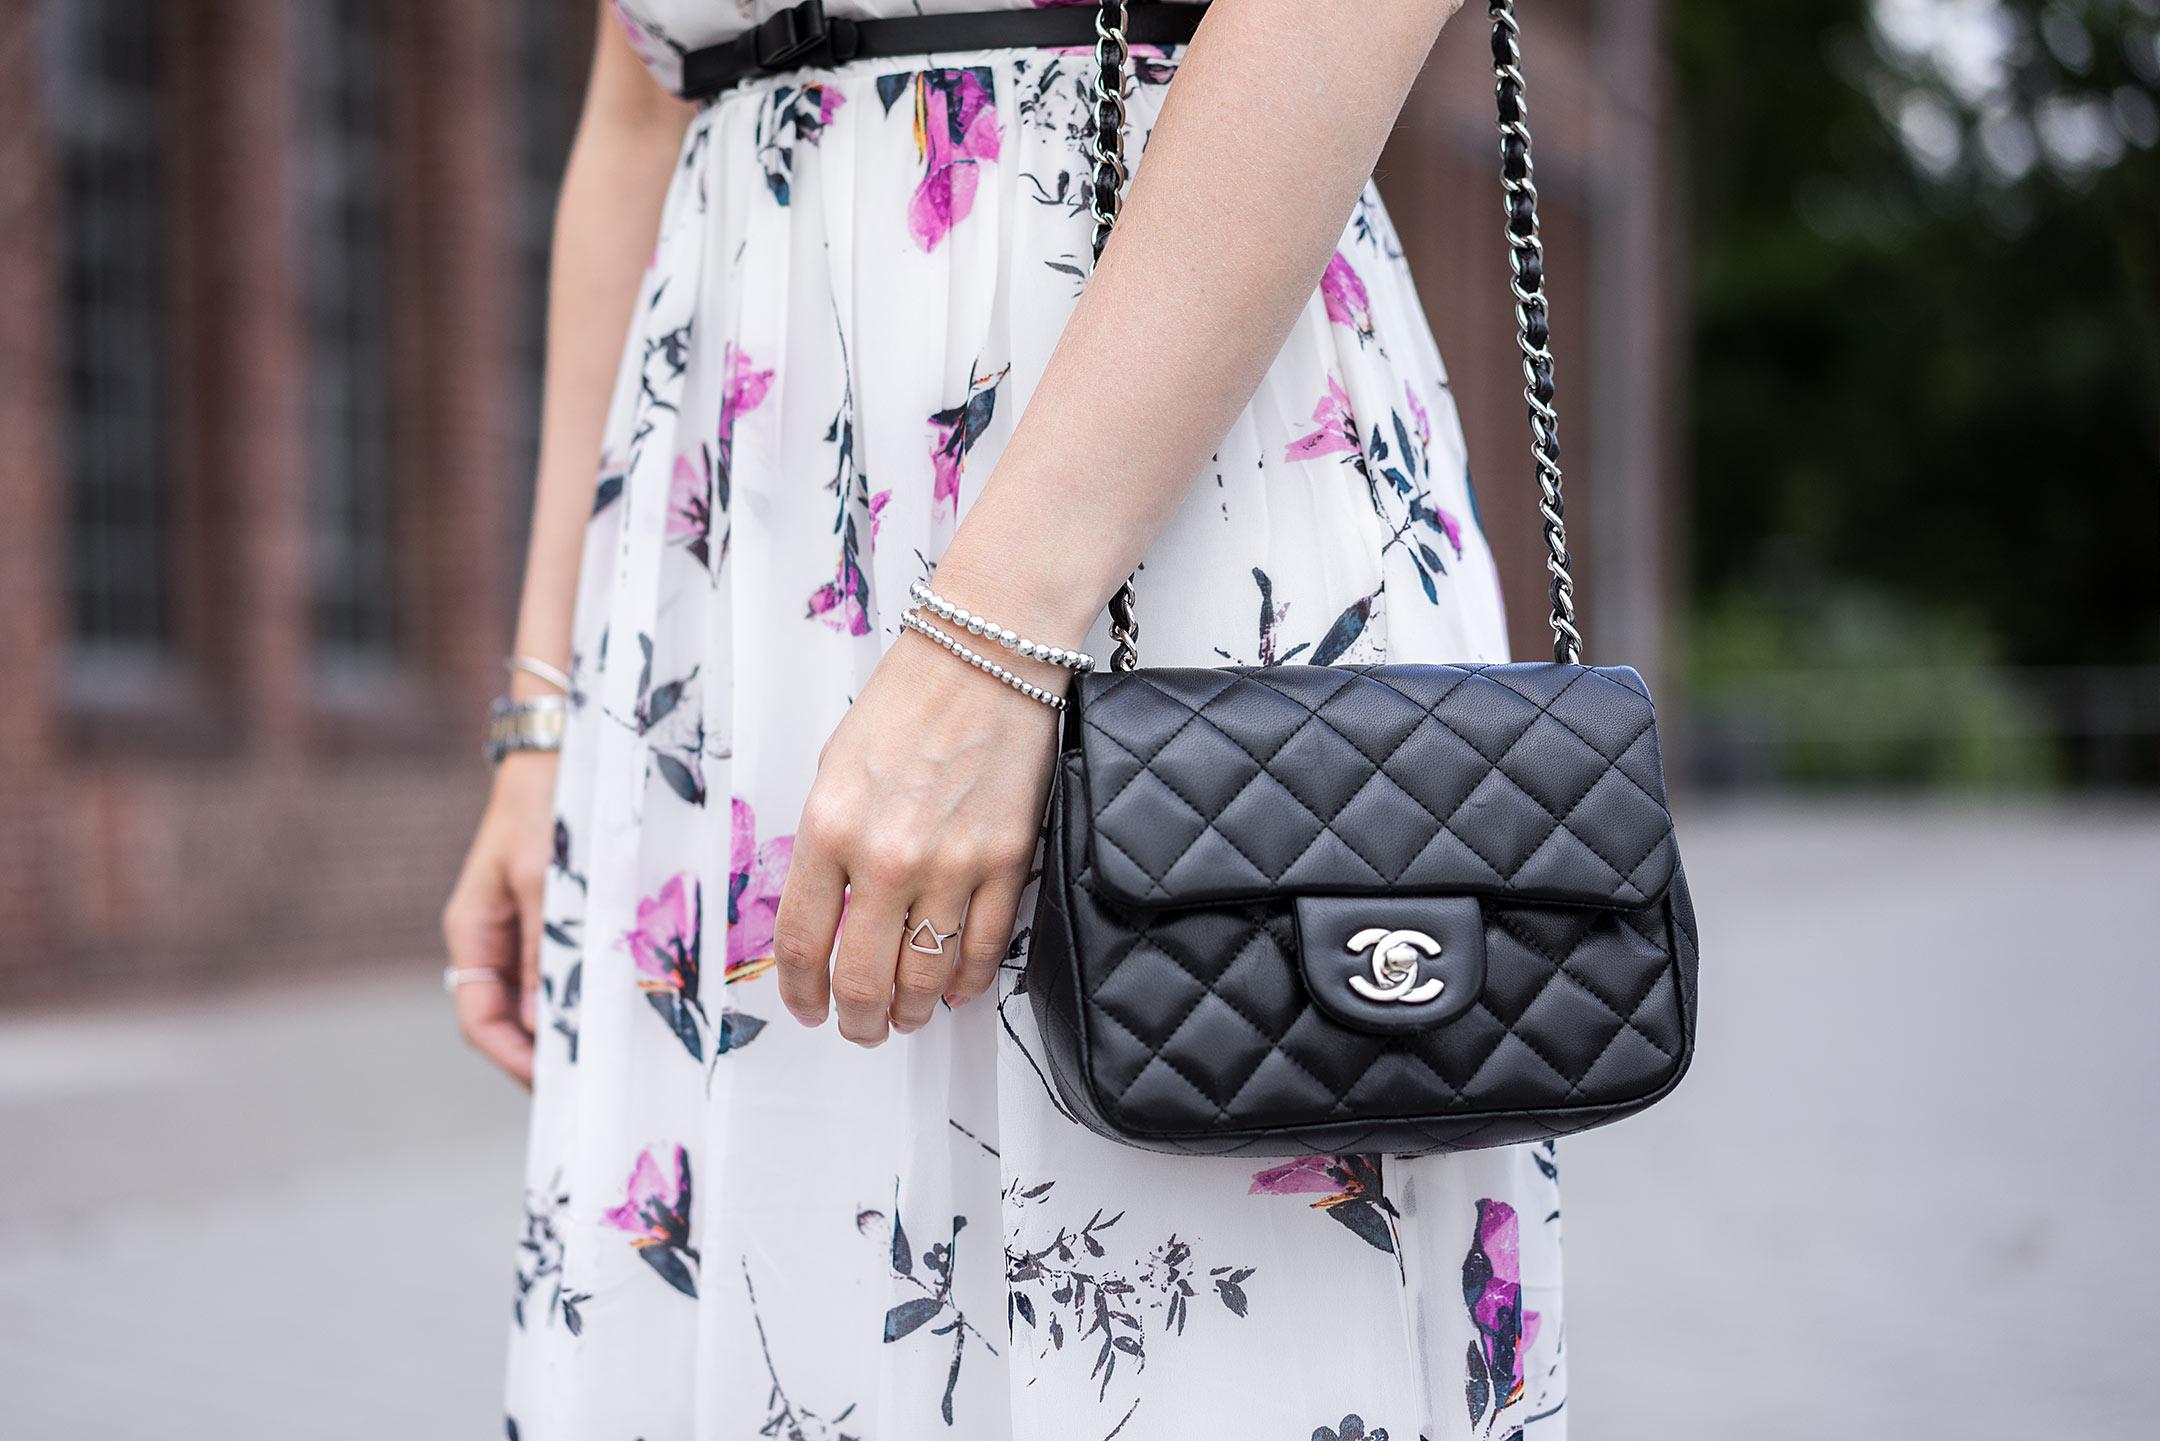 Sommer Accessoires Silber Chanel Tasche Fashion Blog Sunnyinga